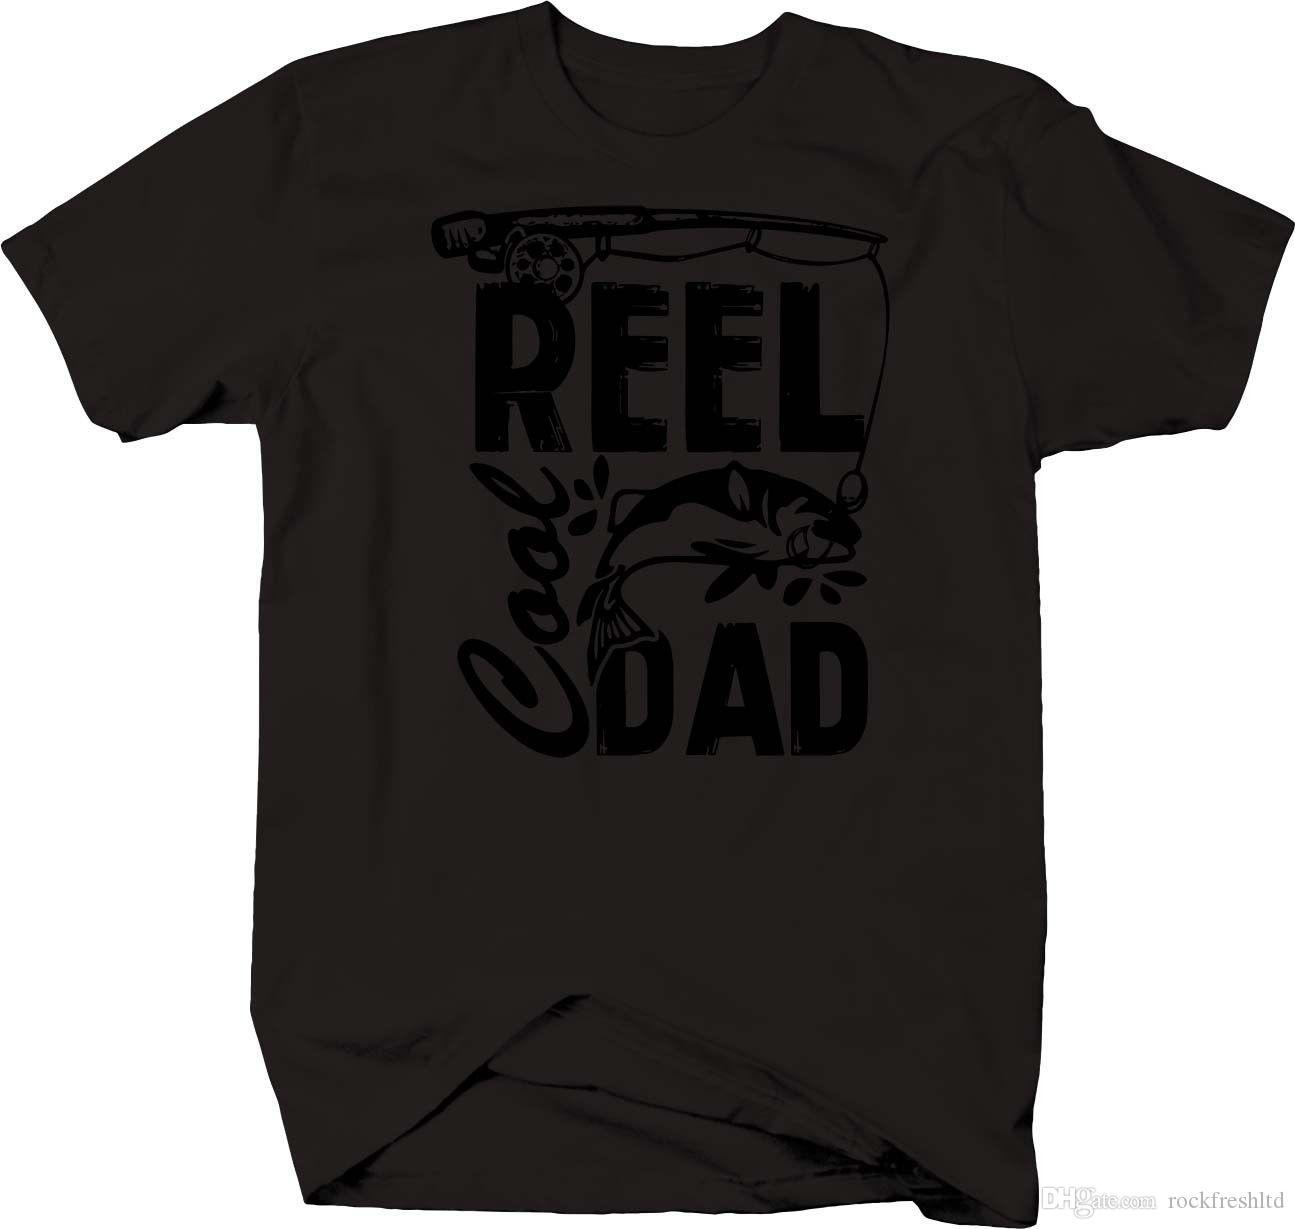 b4c9b85b Reel Cool Dad Fishing Fish Pole T Shirt Band T Shirts T Shirt Designs From  Rockfreshltd, $10.18  DHgate.Com